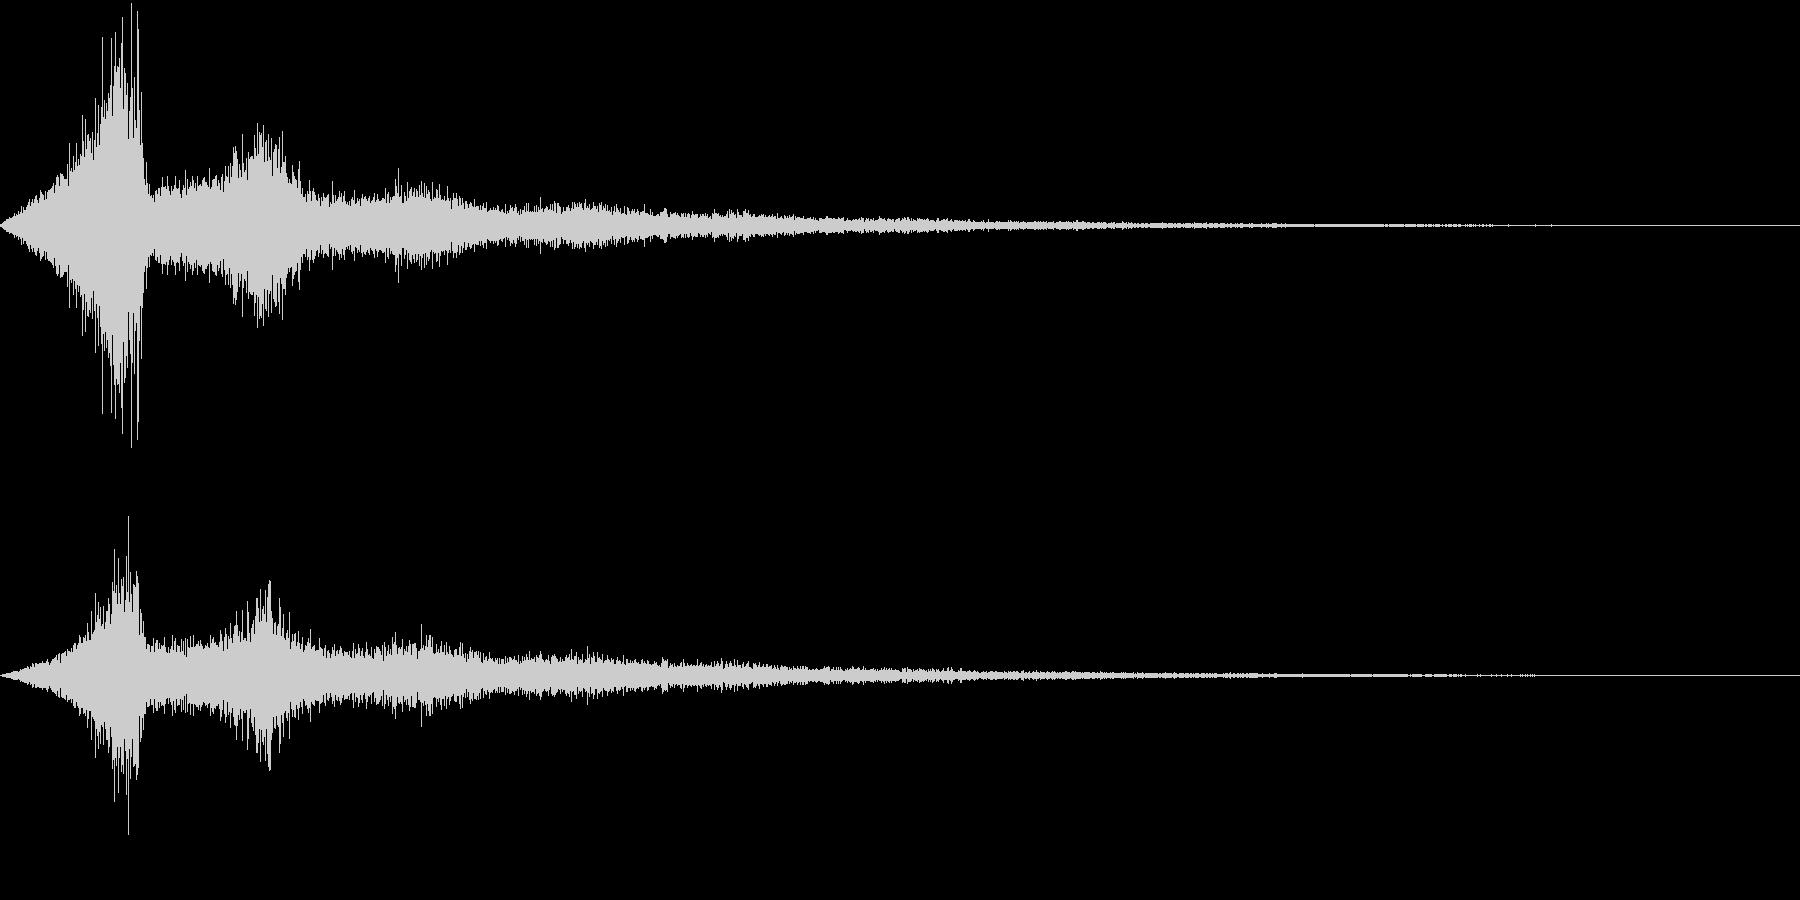 TV RADIO SFX5 強調効果音の未再生の波形